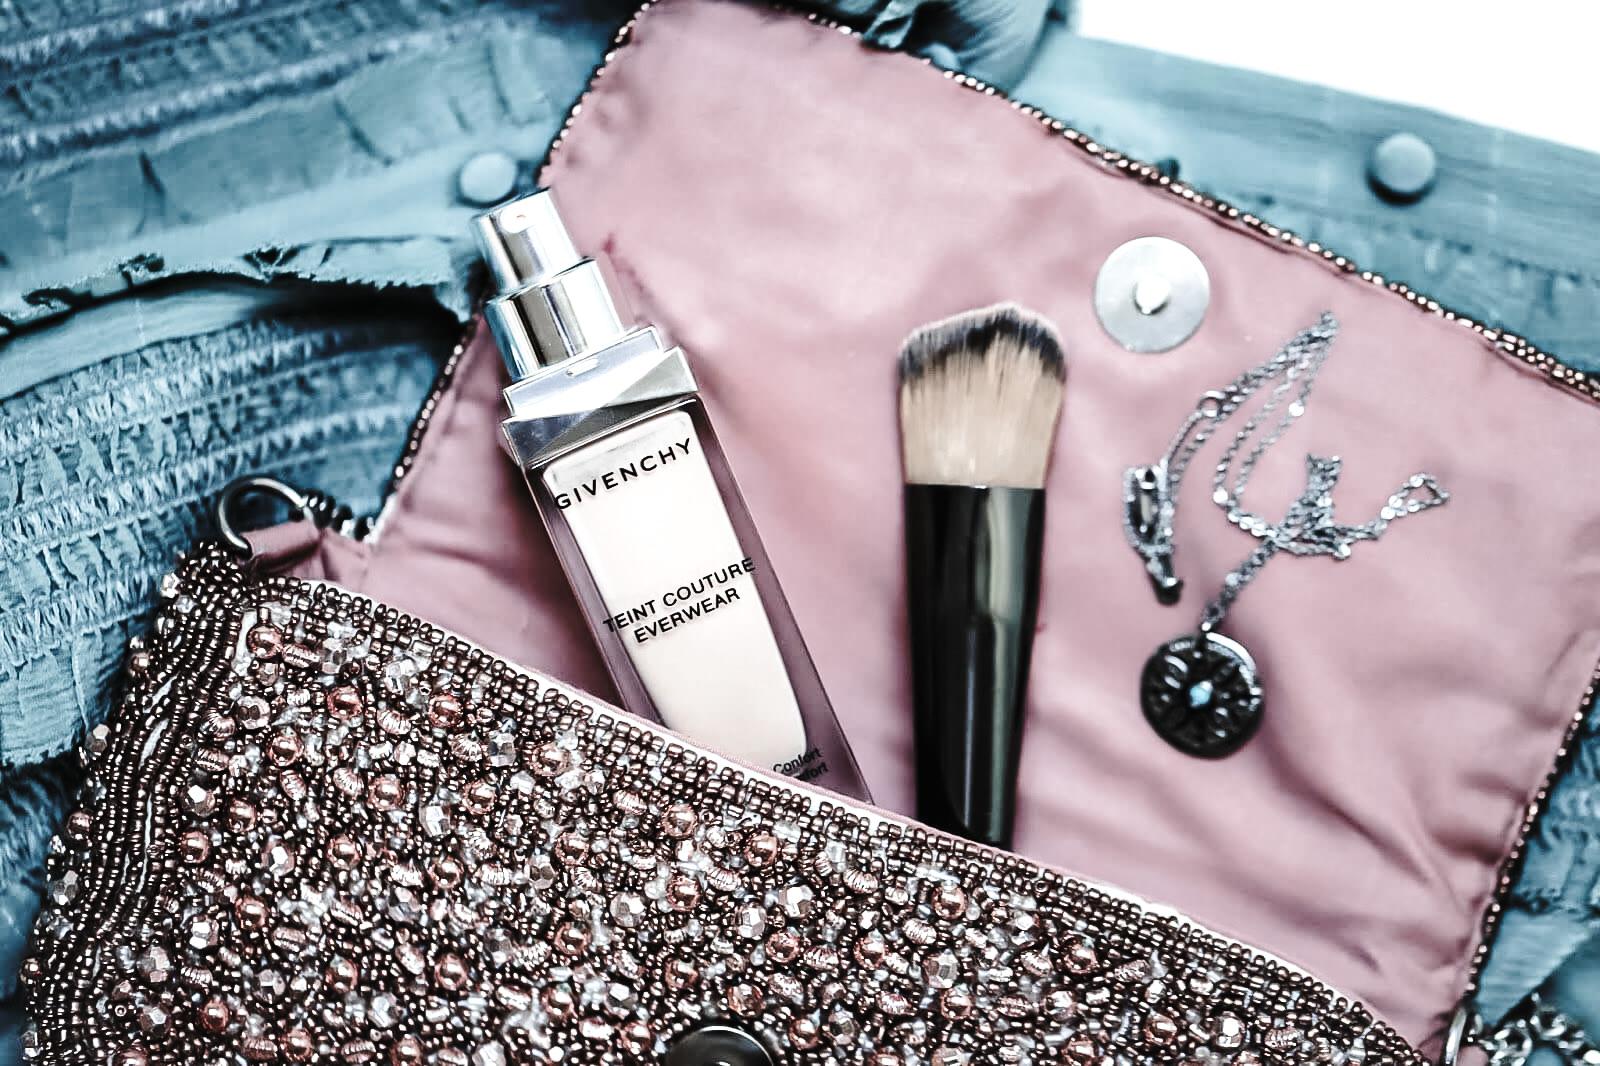 Givenchy Teint Couture Everwear Fond de Teint Avis